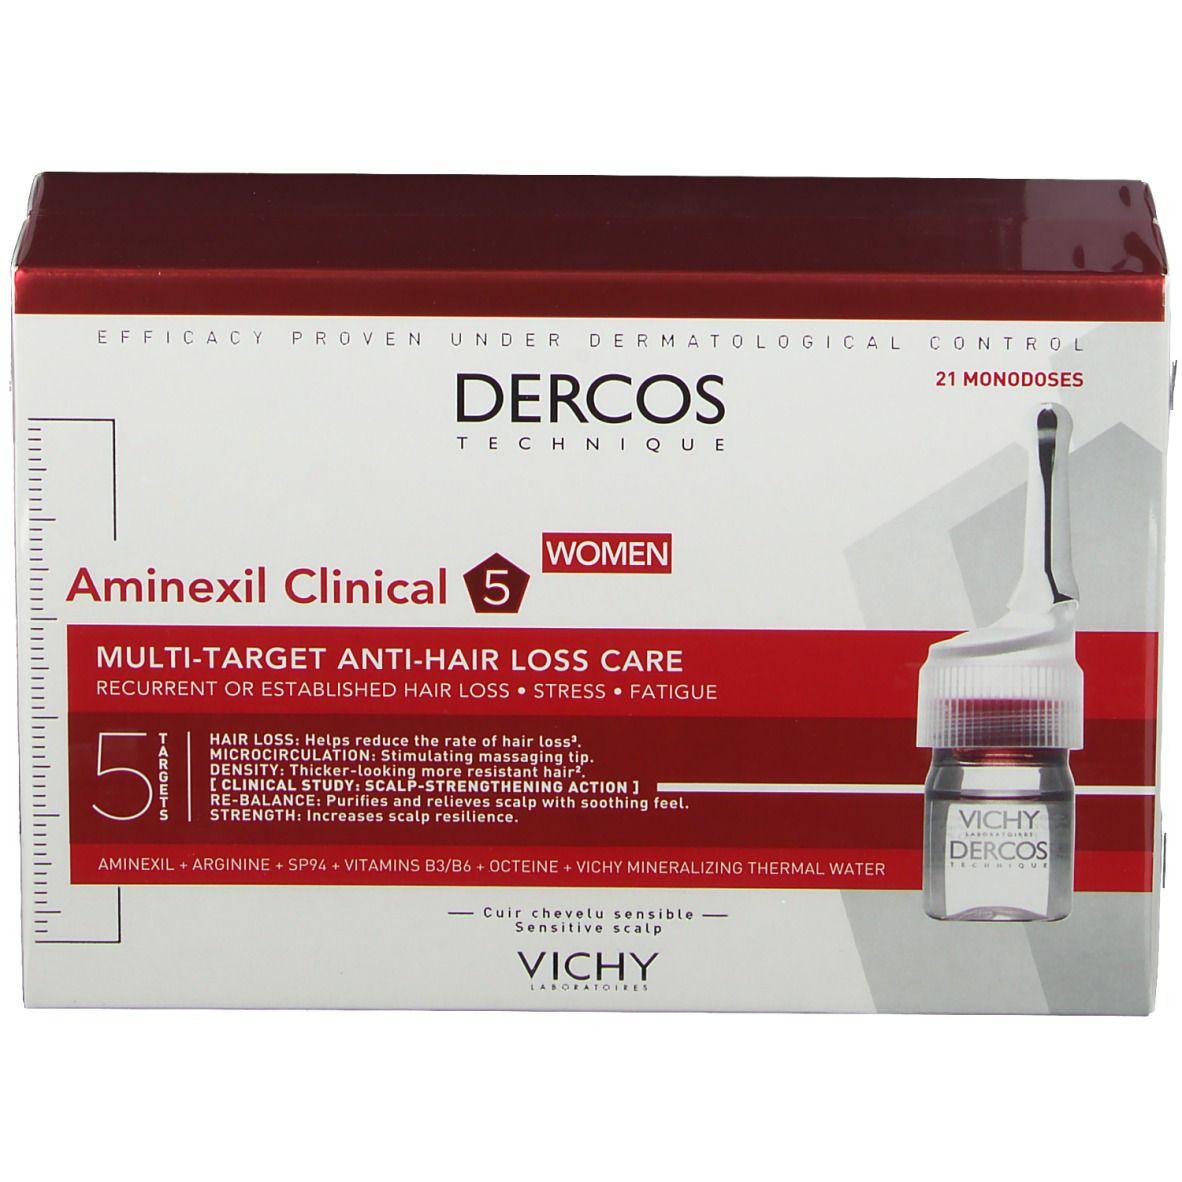 VICHY Dercos Aminexil Clinical 5